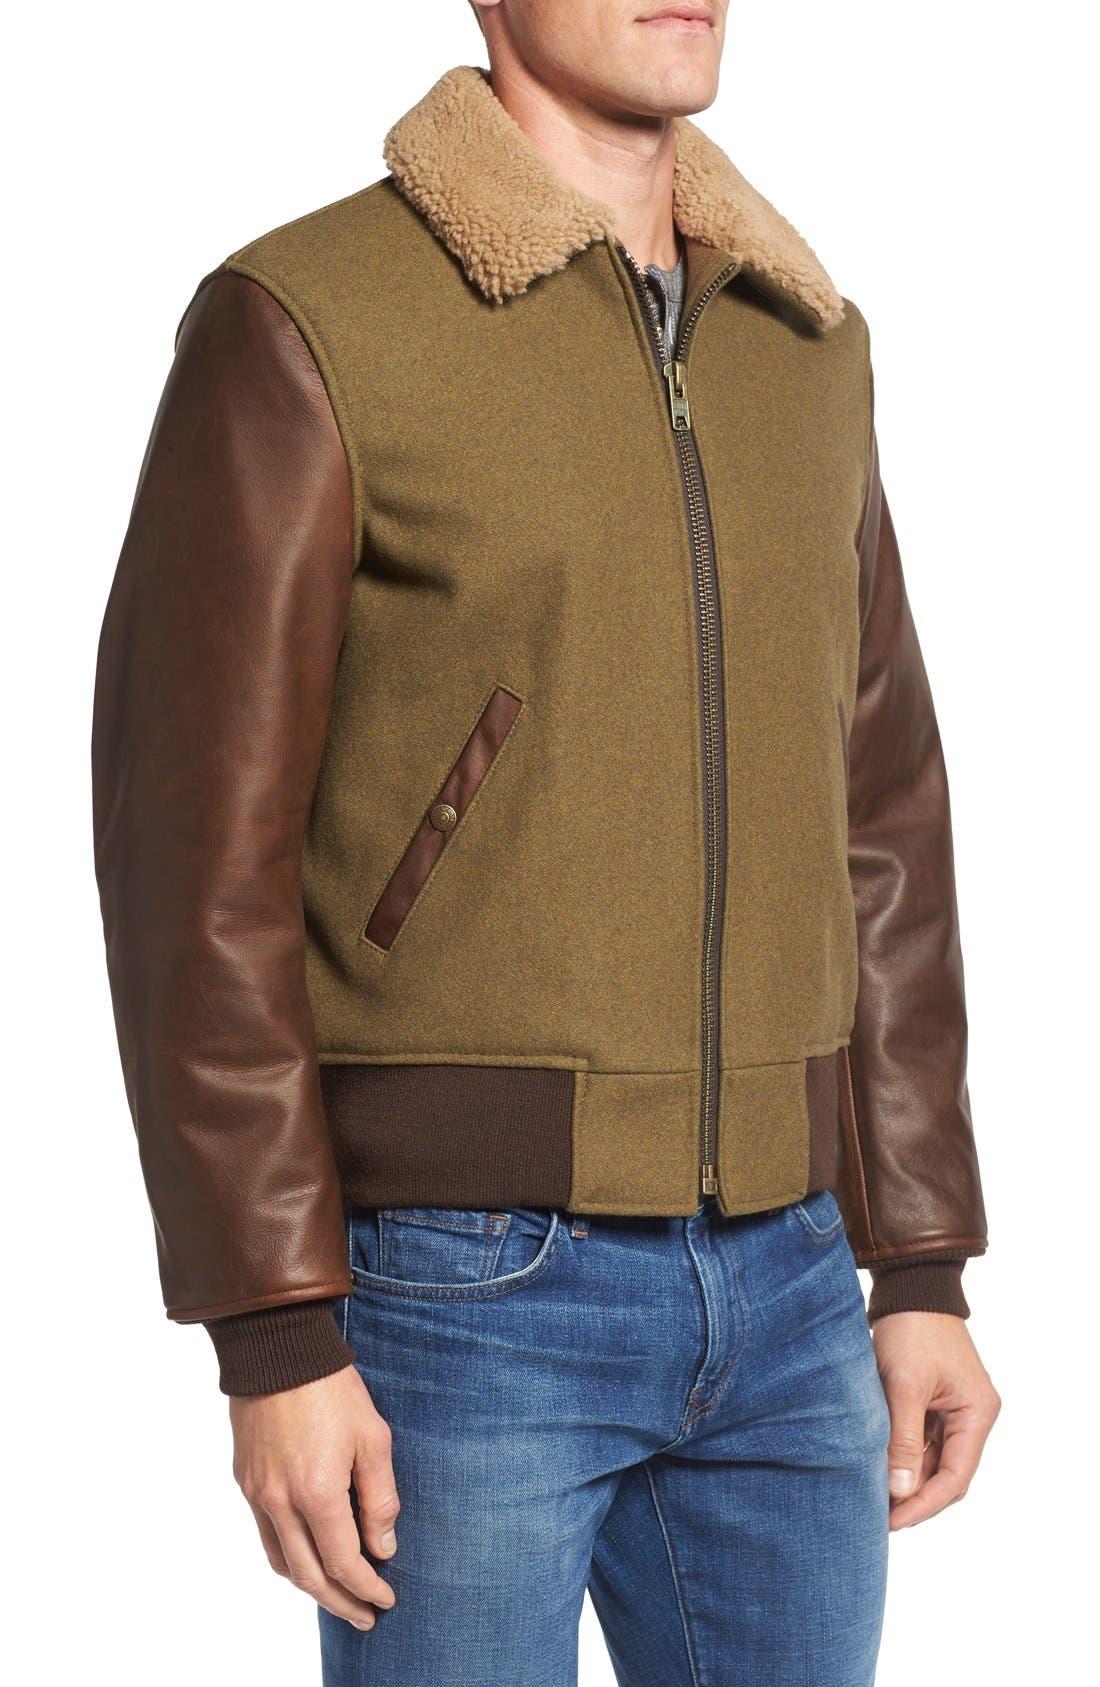 Mixed Media B-15 Flight Jacket with Genuine Shearling Collar,                             Alternate thumbnail 4, color,